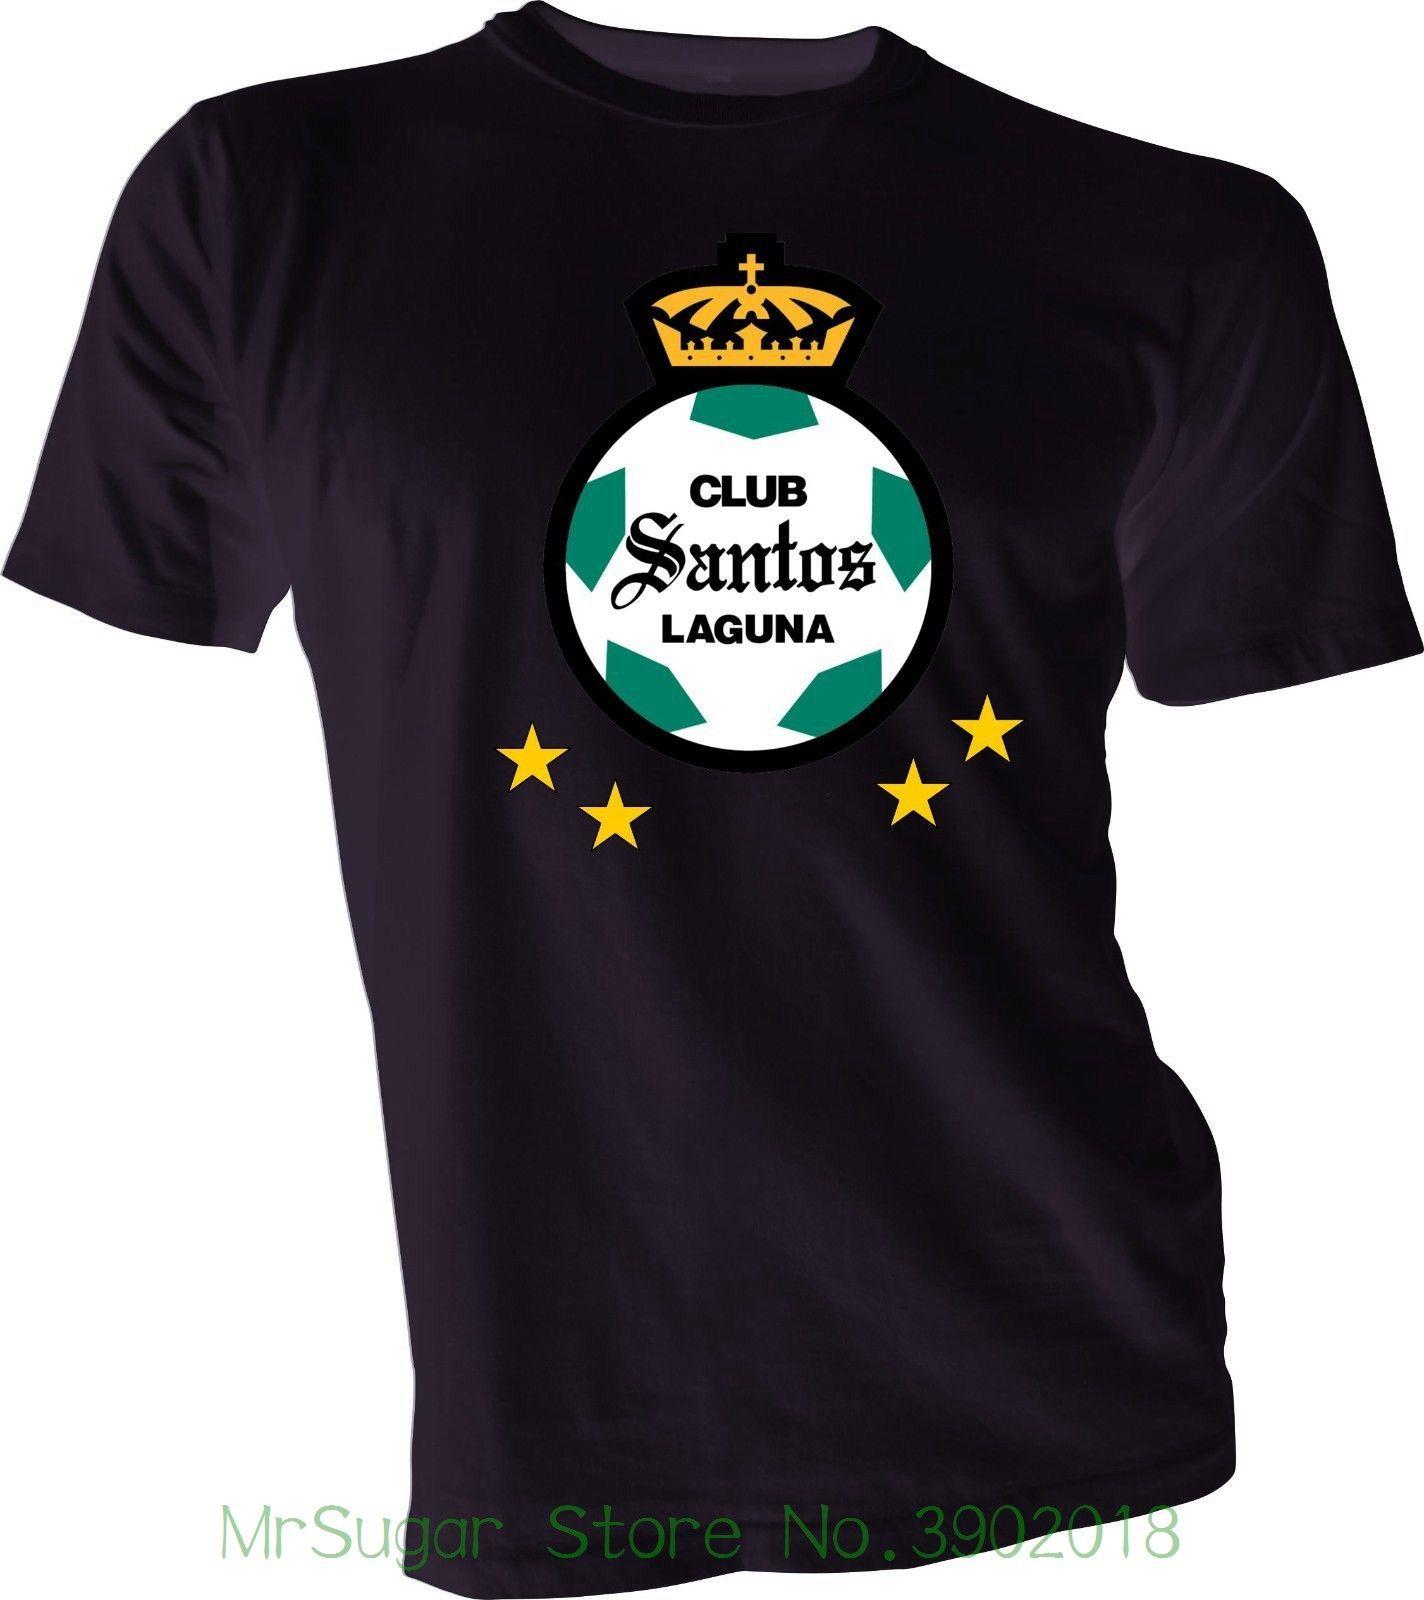 on sale d64a5 18850 Club Santos Laguna Los Guerreros Liga Mx Mexico Futbol Soccerite Black  T-shirt New Short-sleeved Print Letters